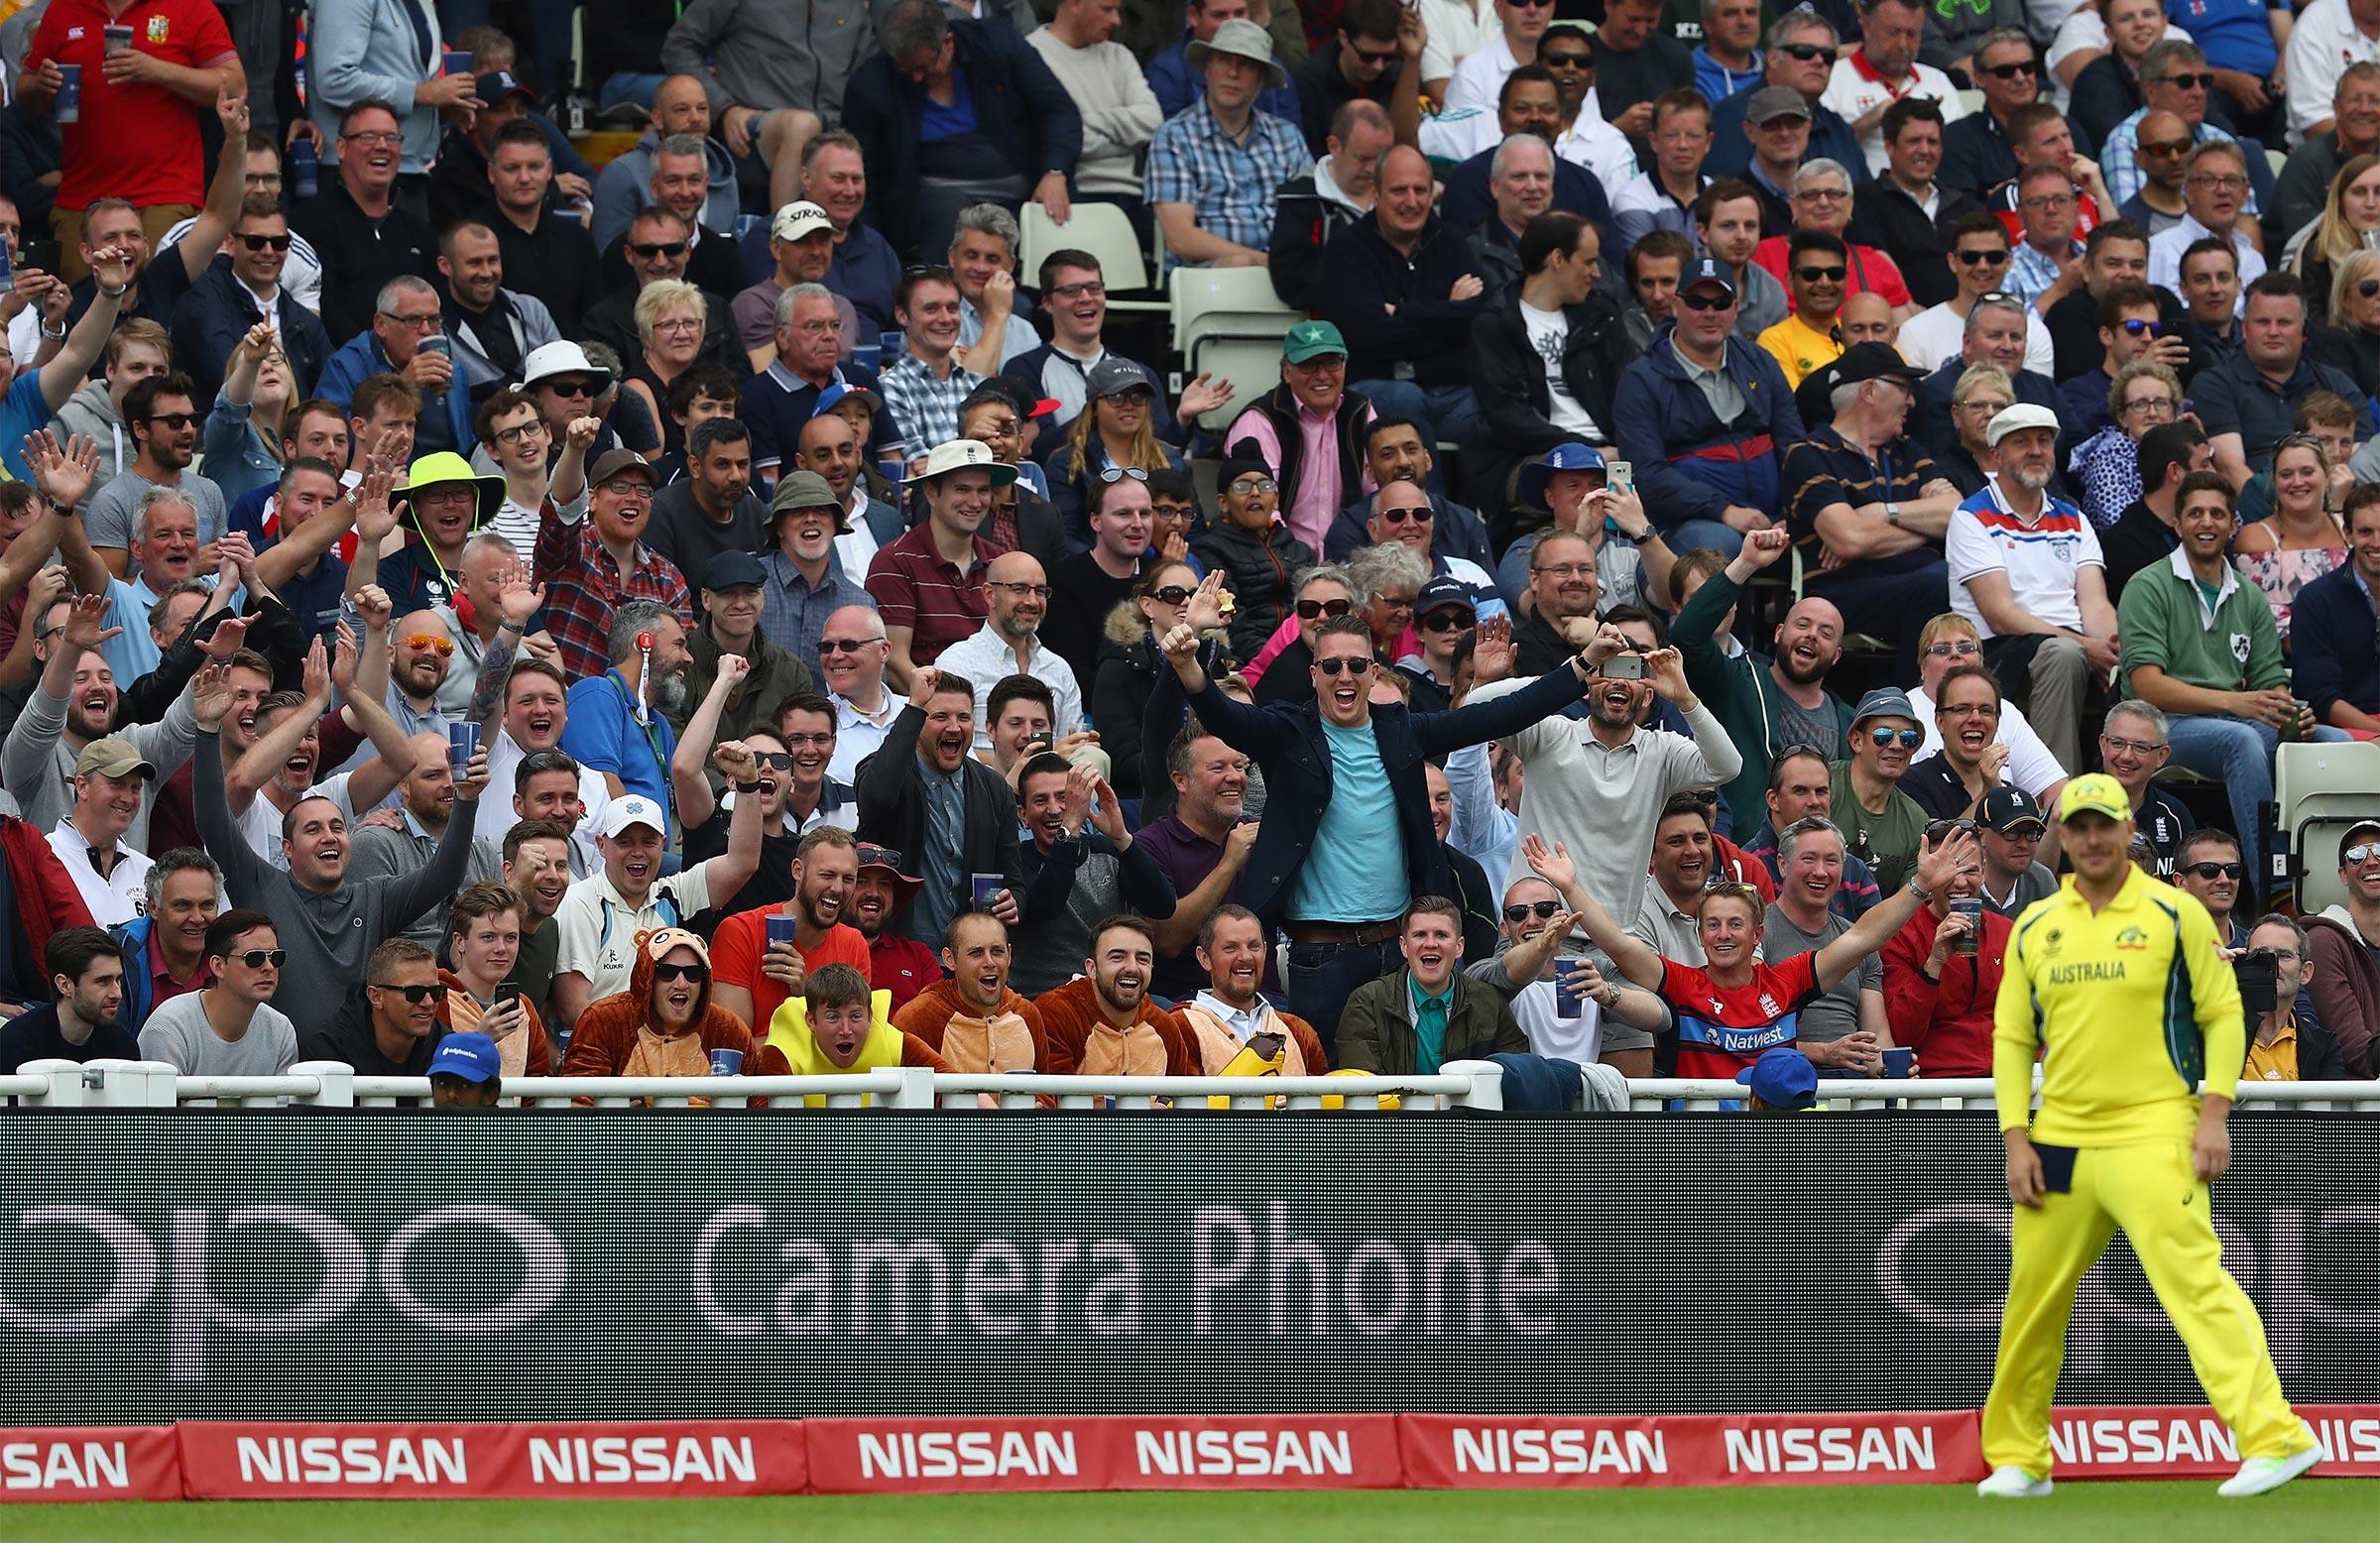 Champions Trophy: Warne 'honours' Ganguly's bet, will wear England ODI shirt soon